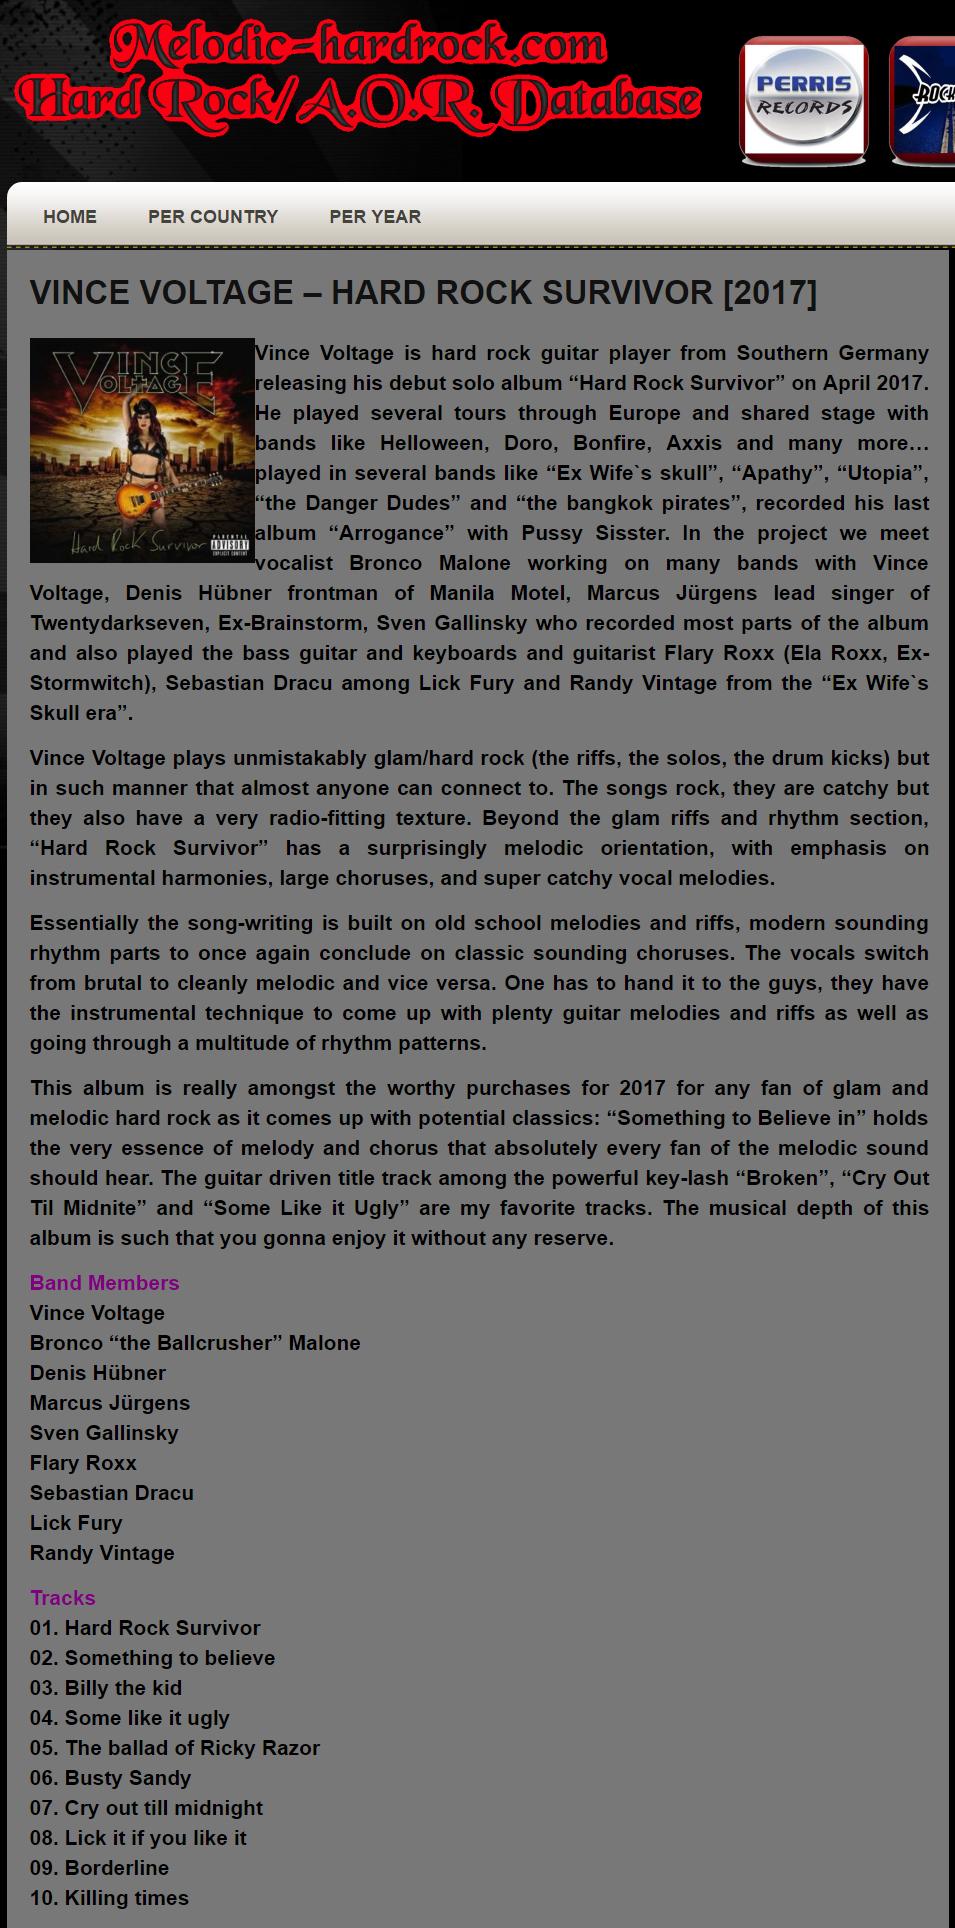 melodic hardrock.com online magazine